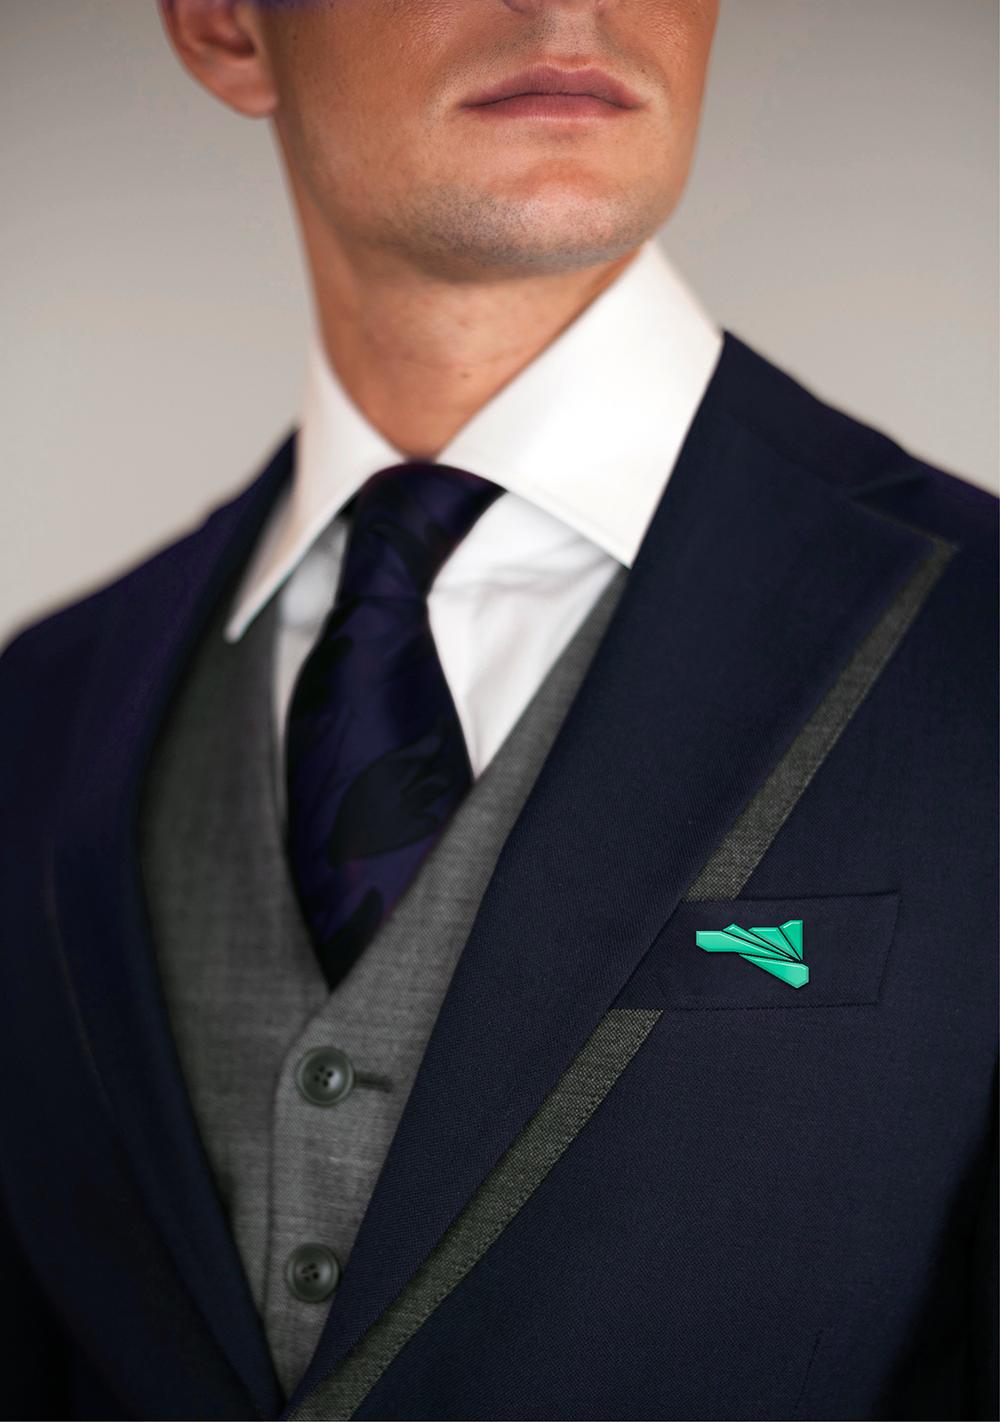 Concept staff uniform